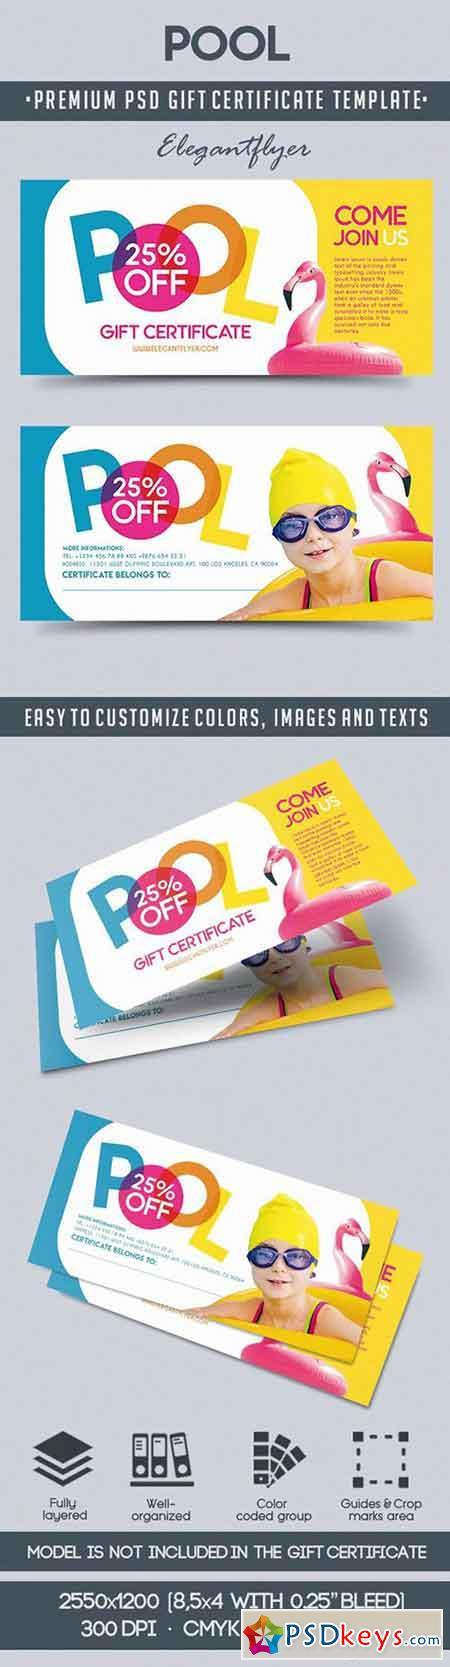 Pool – Premium Gift Certificate PSD Template